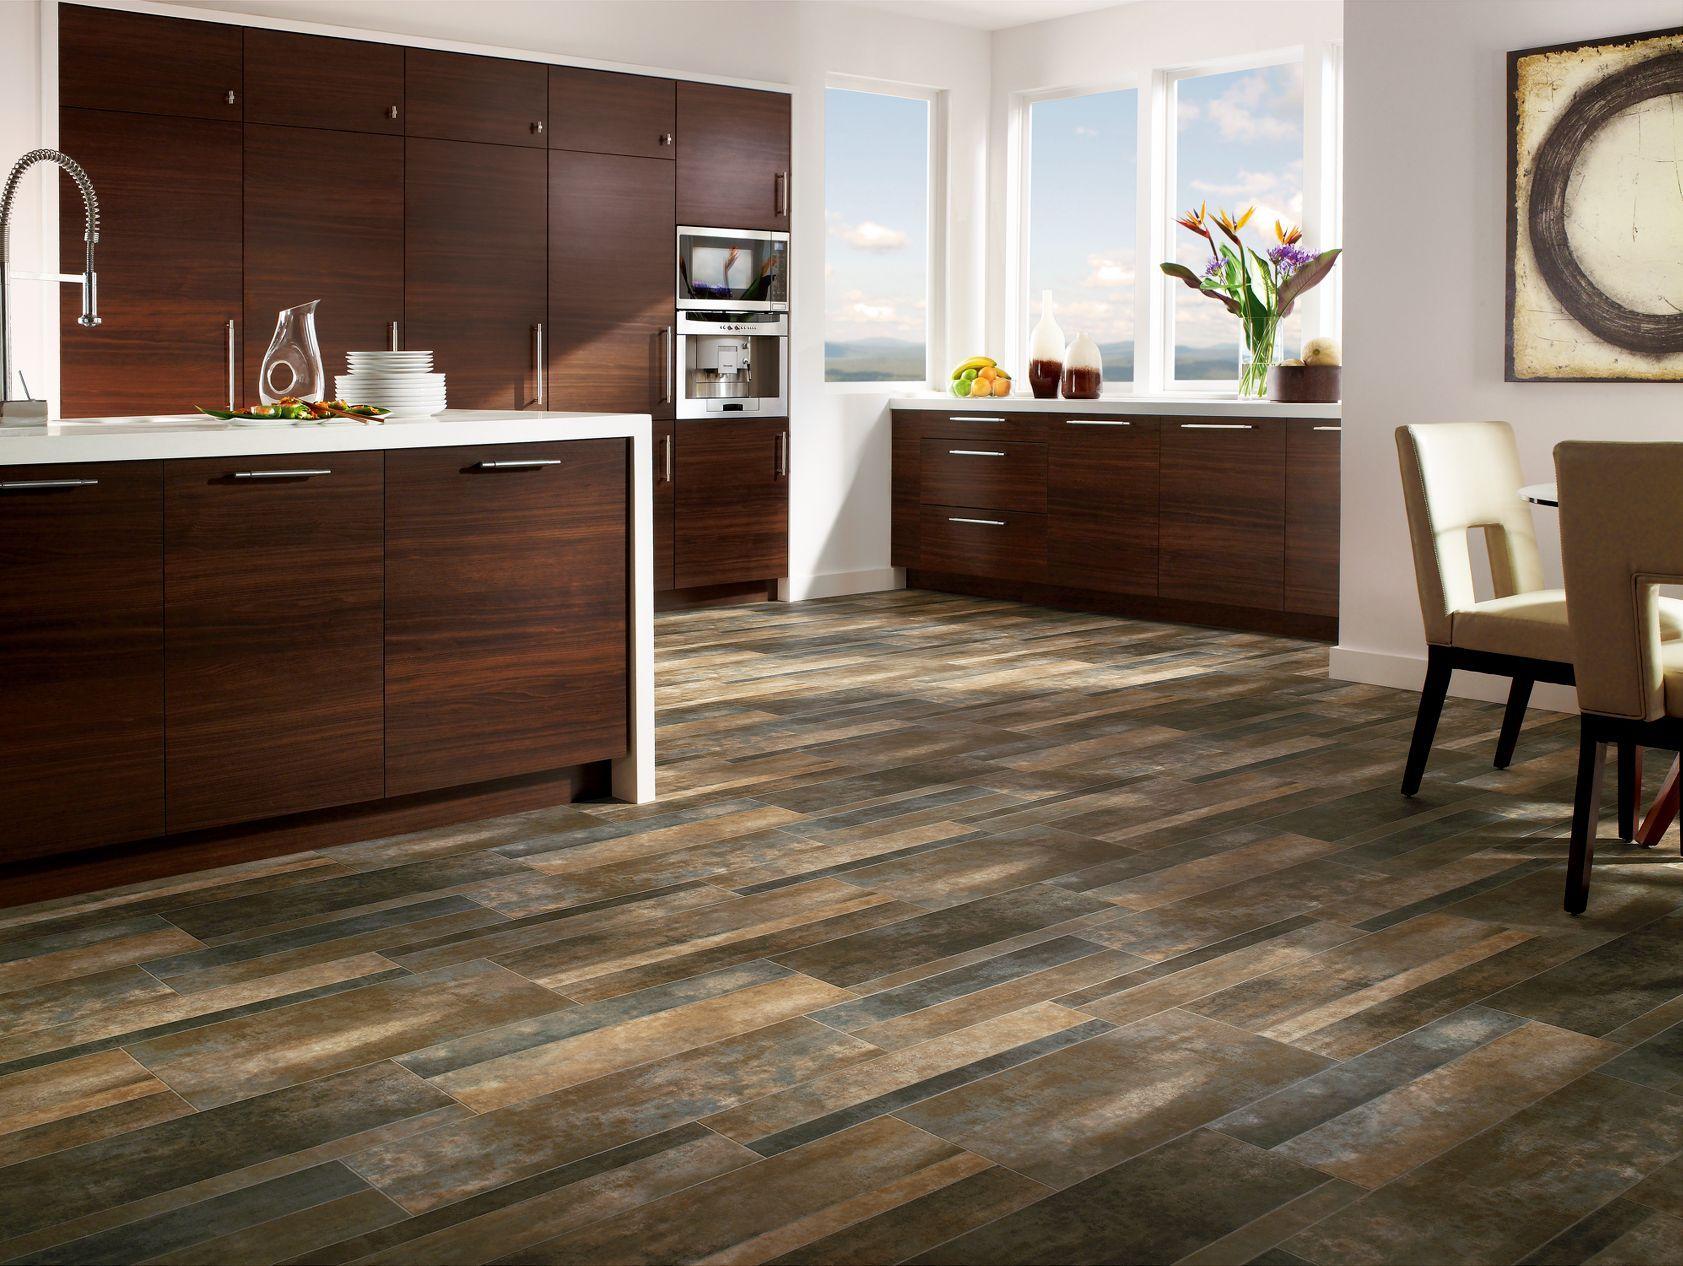 Appealing Vinyl Plank Flooring For Exciting Interior Floor Design Modern Kitchen With Dark